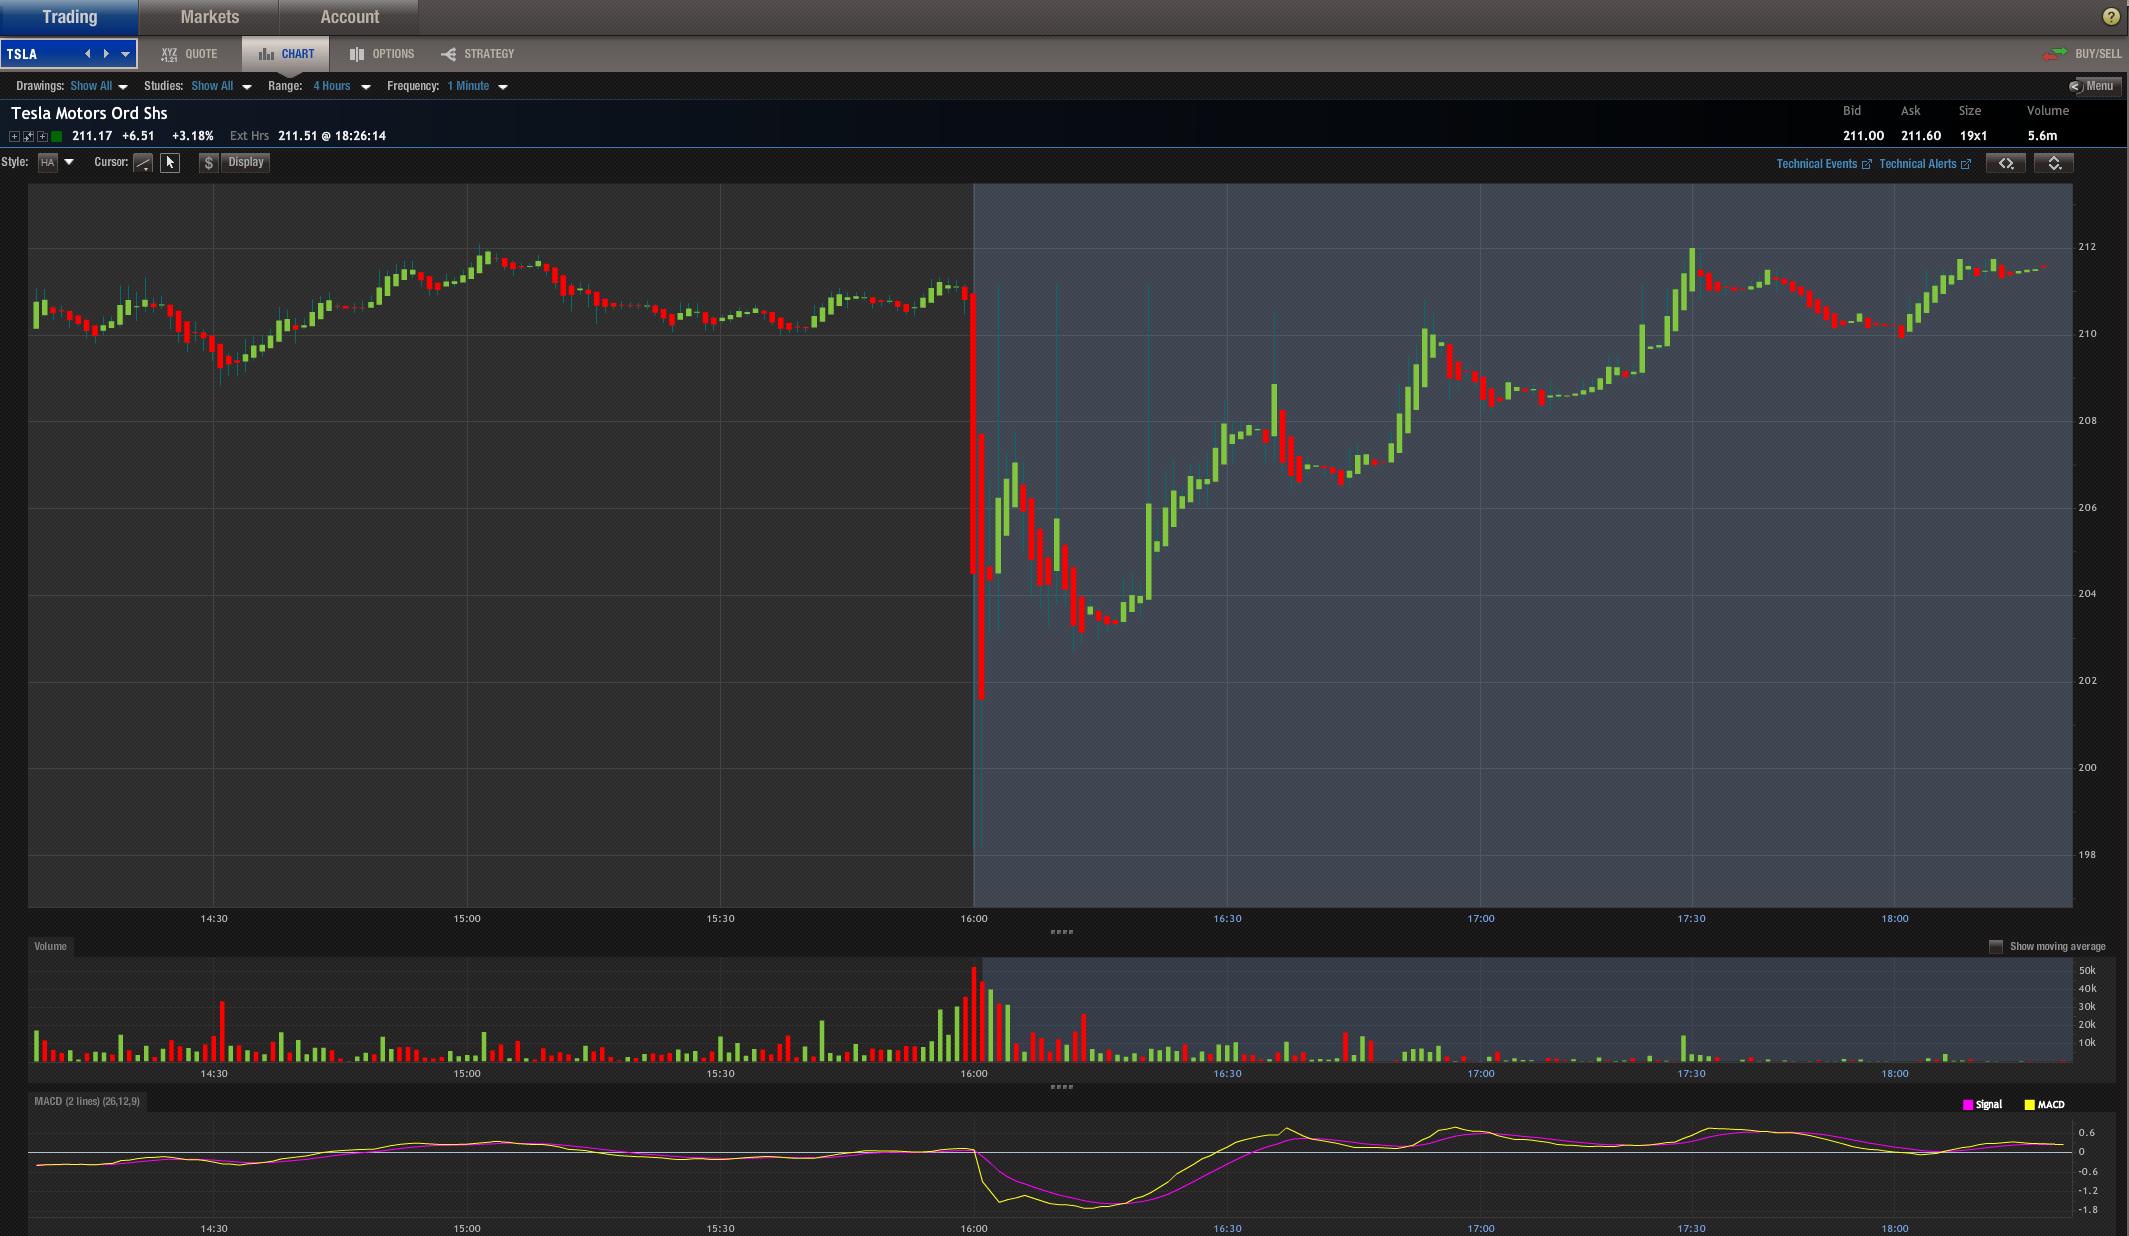 Tesla To Sell 2 Billion Worth Of Common Stock To Fund Model 3 Teslarati Forum